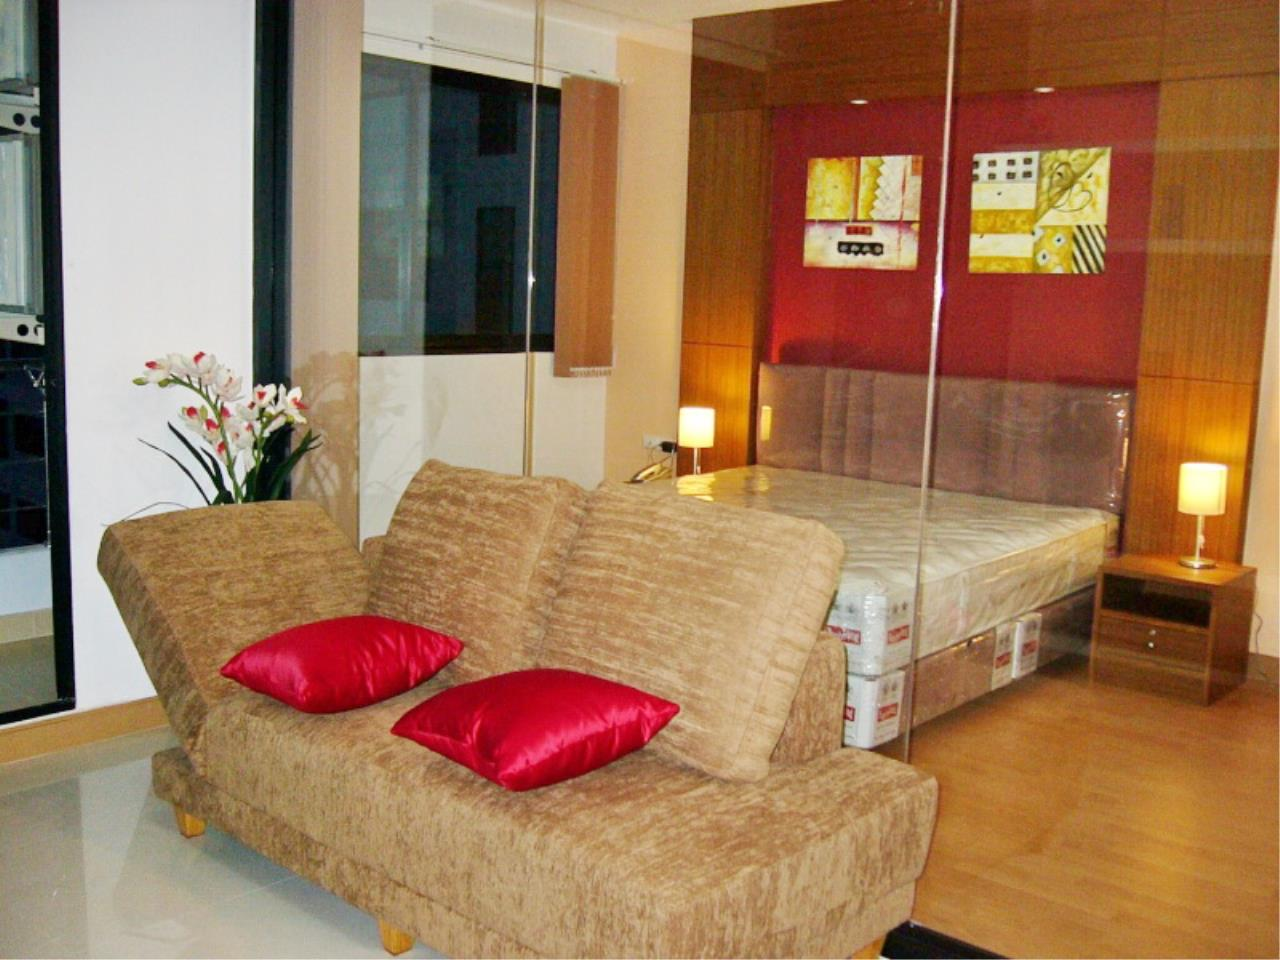 Agent - Mayteekul Sujirapinyokul Agency's AC4180418 For Rent Condo Supalai Premier Place Asoke Condo MRT Phetchaburi 1